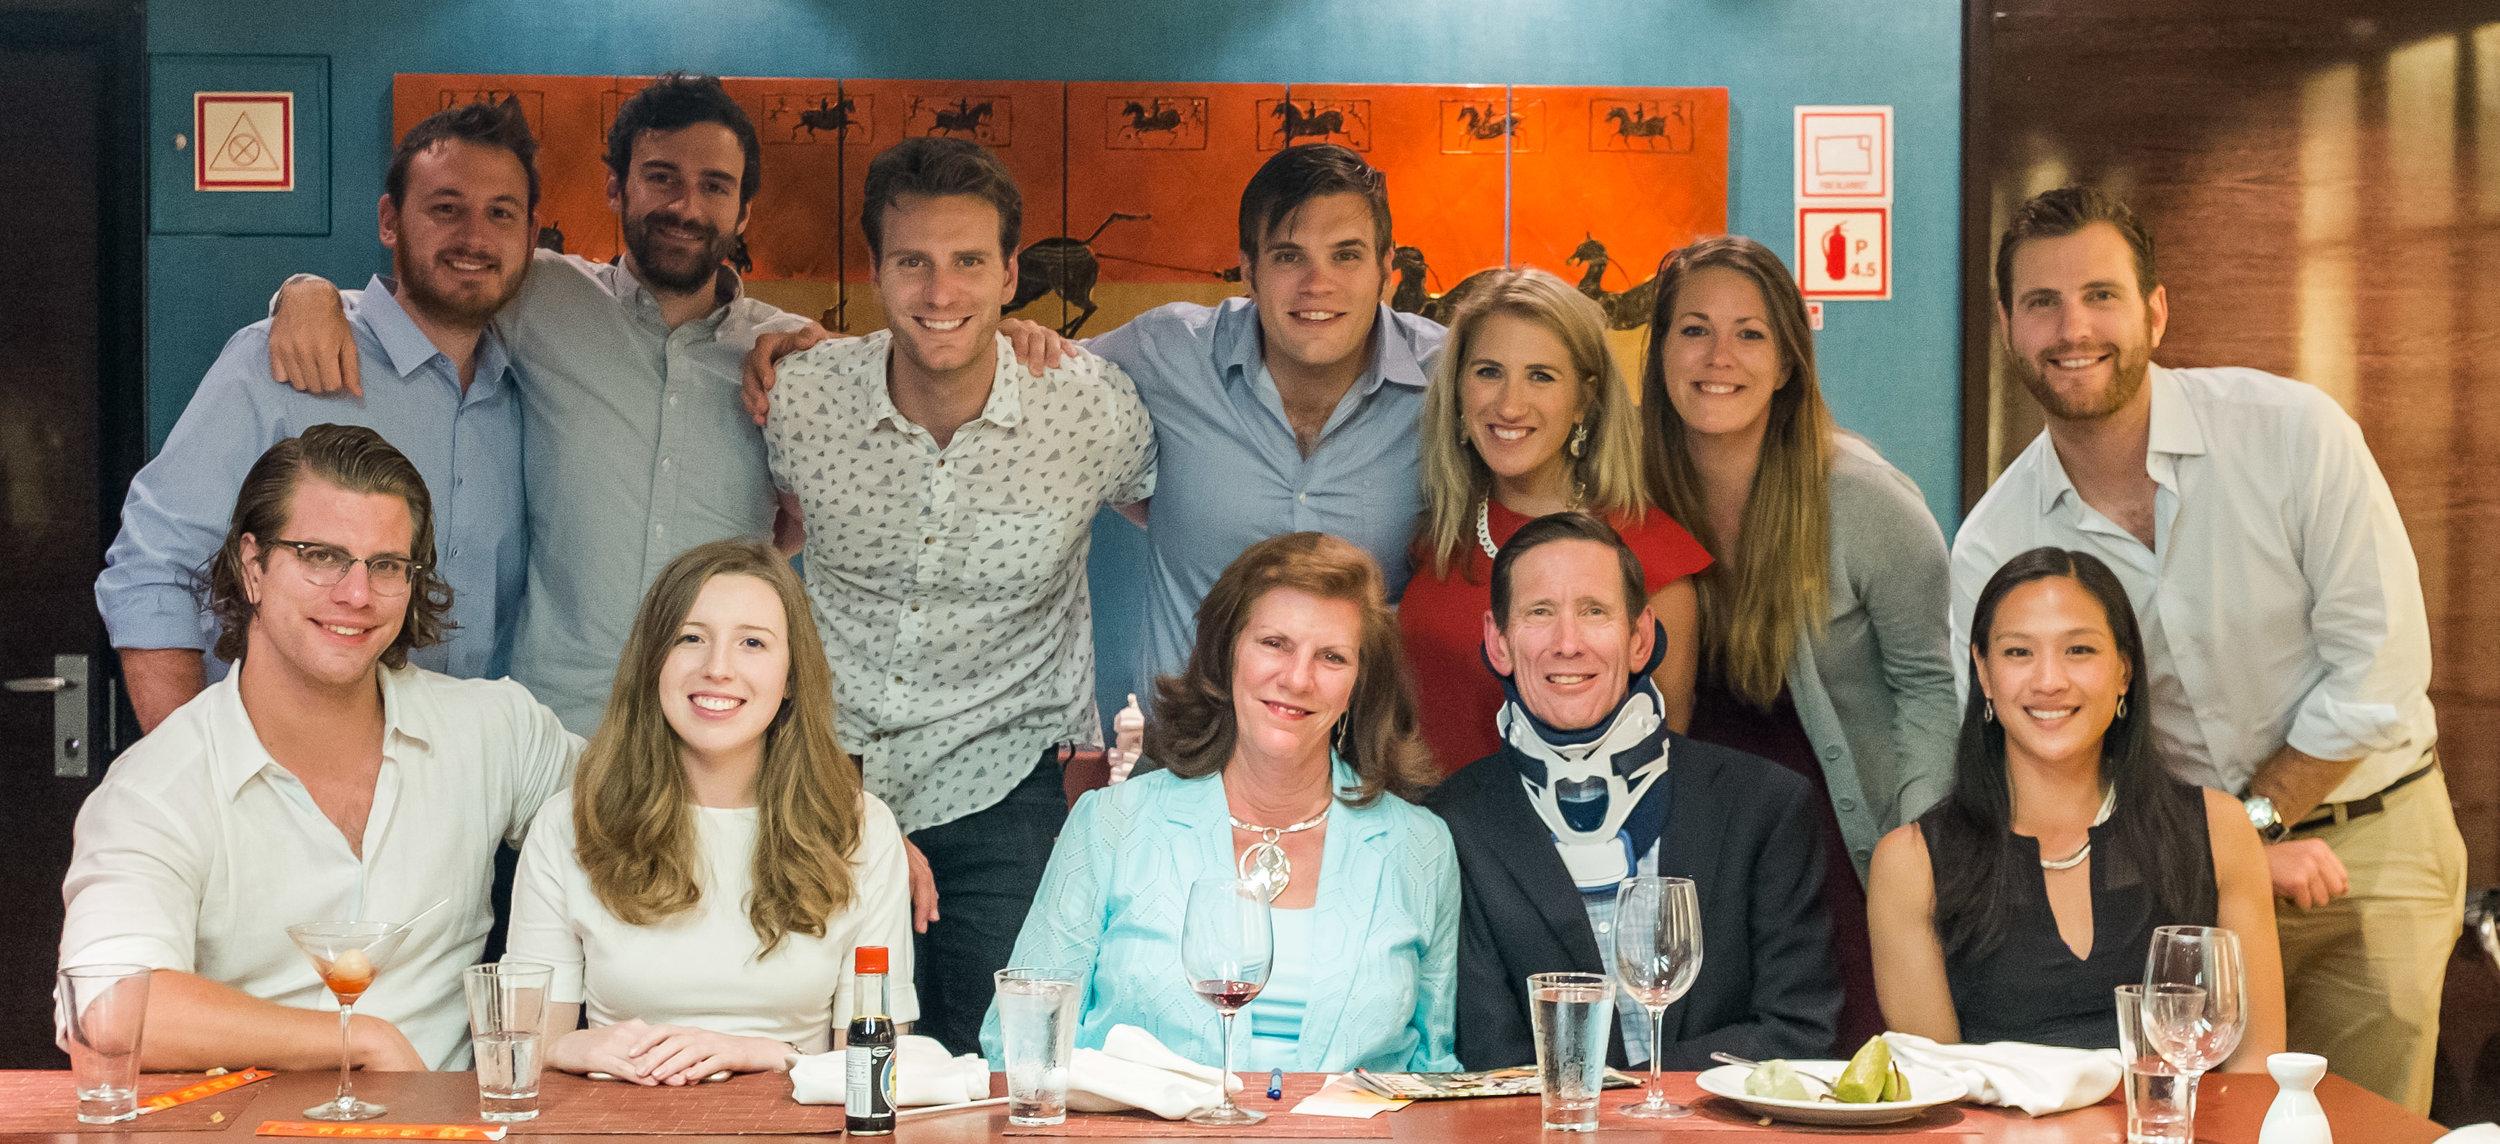 Back row: Patrick, Taylor, Mark, Paul, Jacky, Emily, Evan  Front row: Peter, Kallista, Kathy, John, Peiling